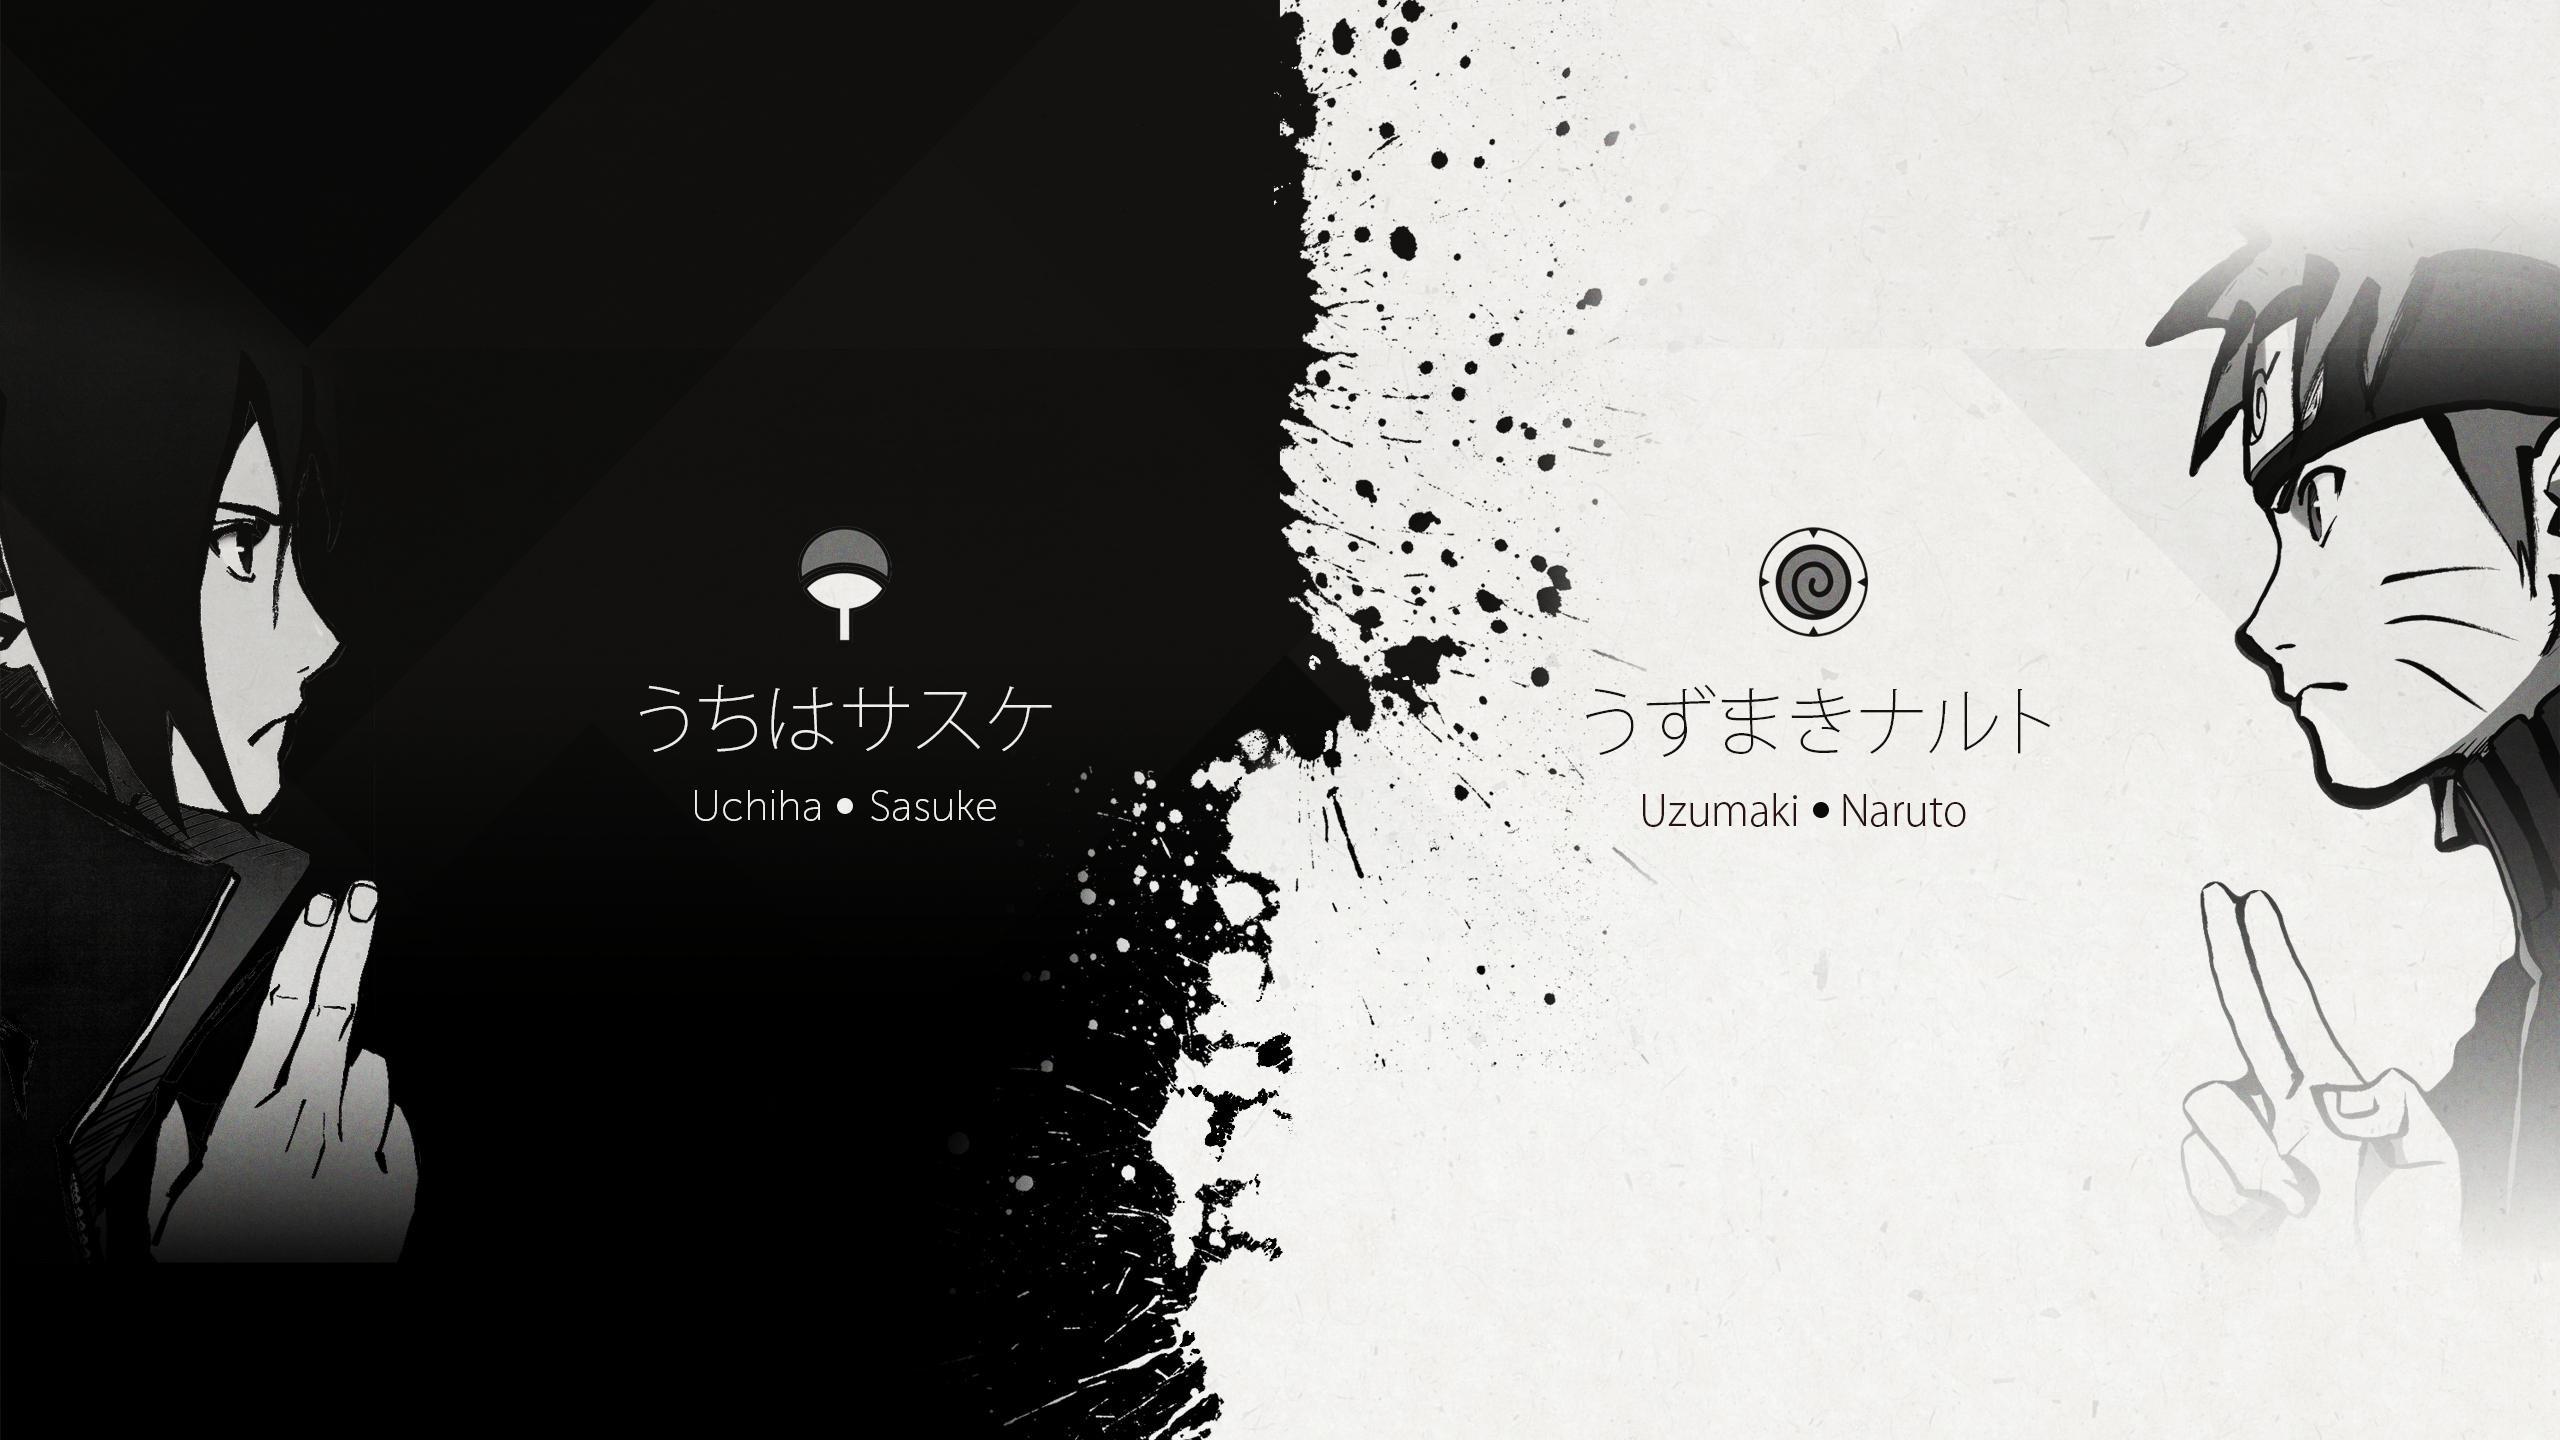 Sasuke Uchiha Wallpapers Hd 64 Images